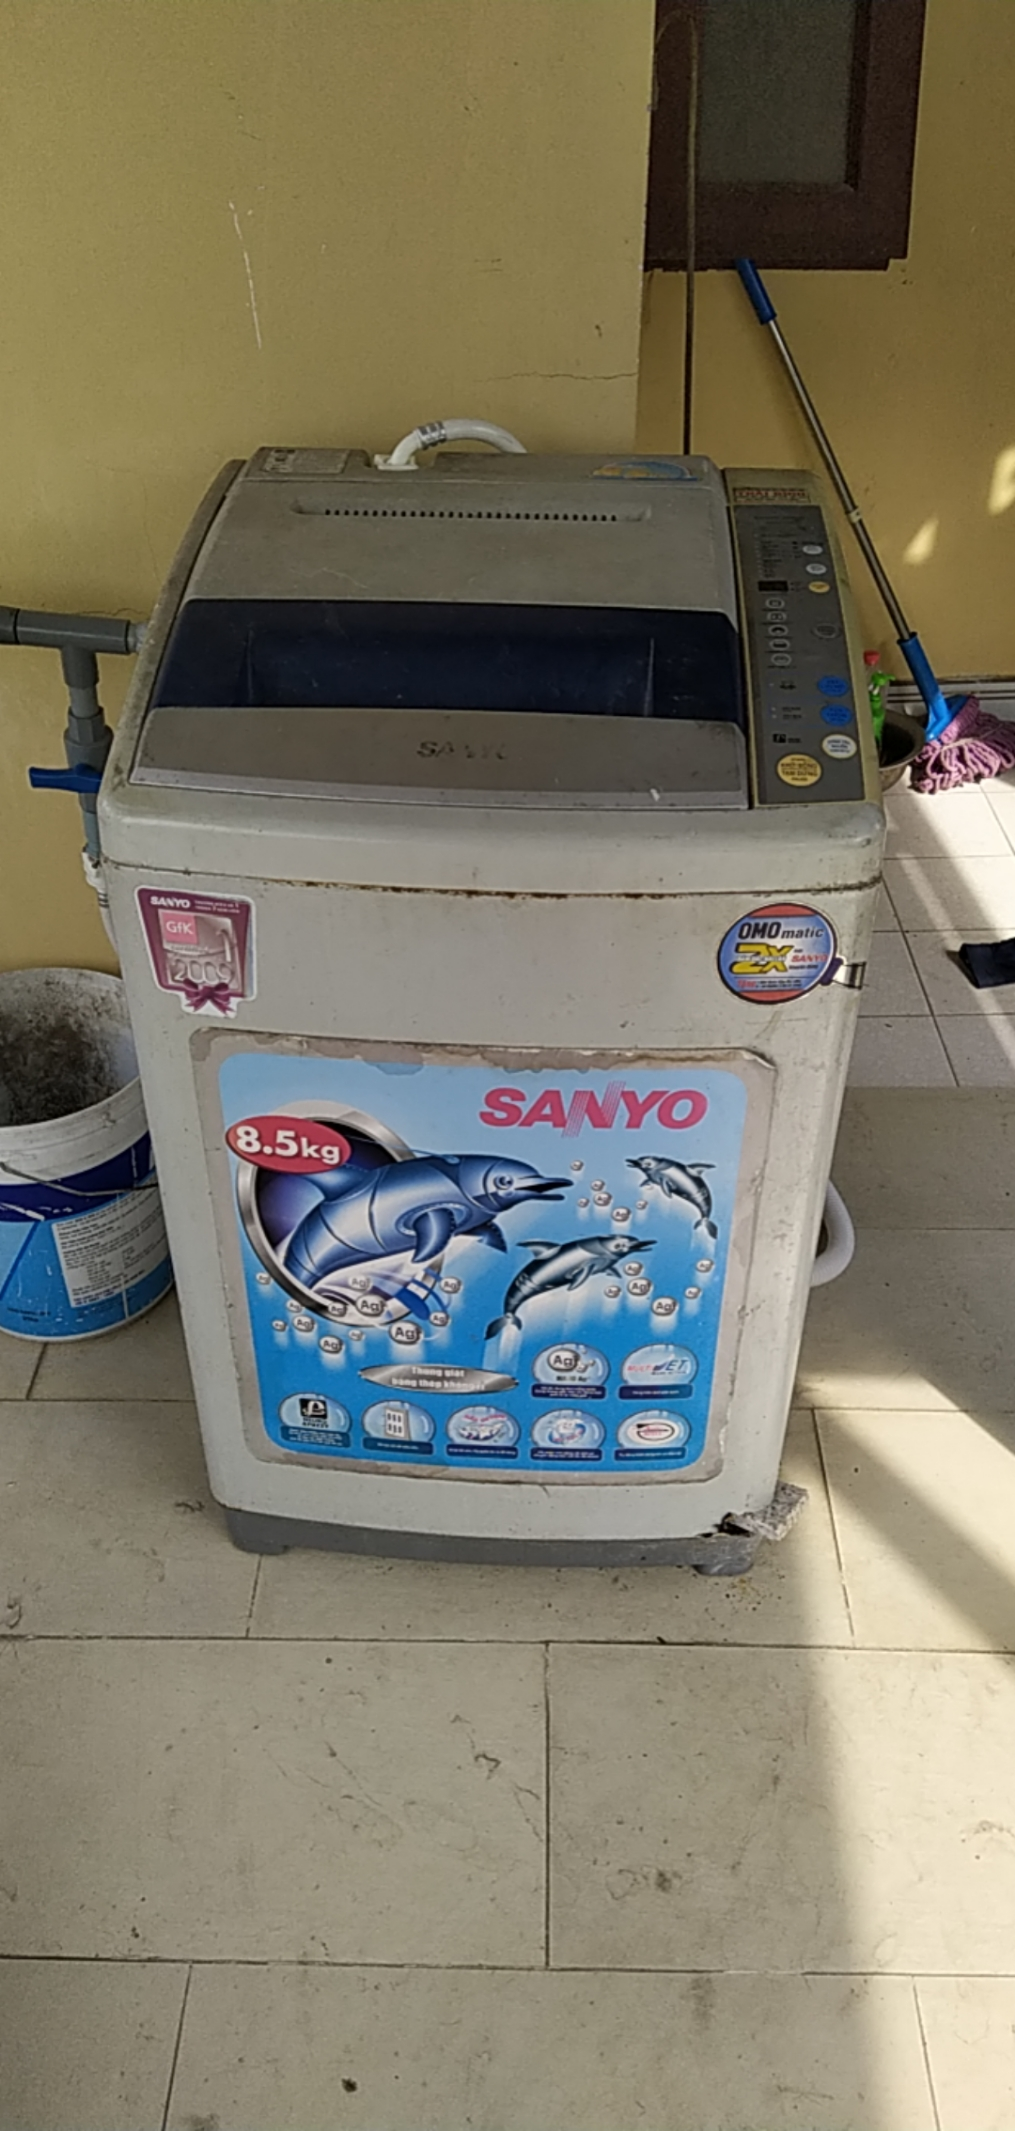 thợ sửa máy giặt Sanyo